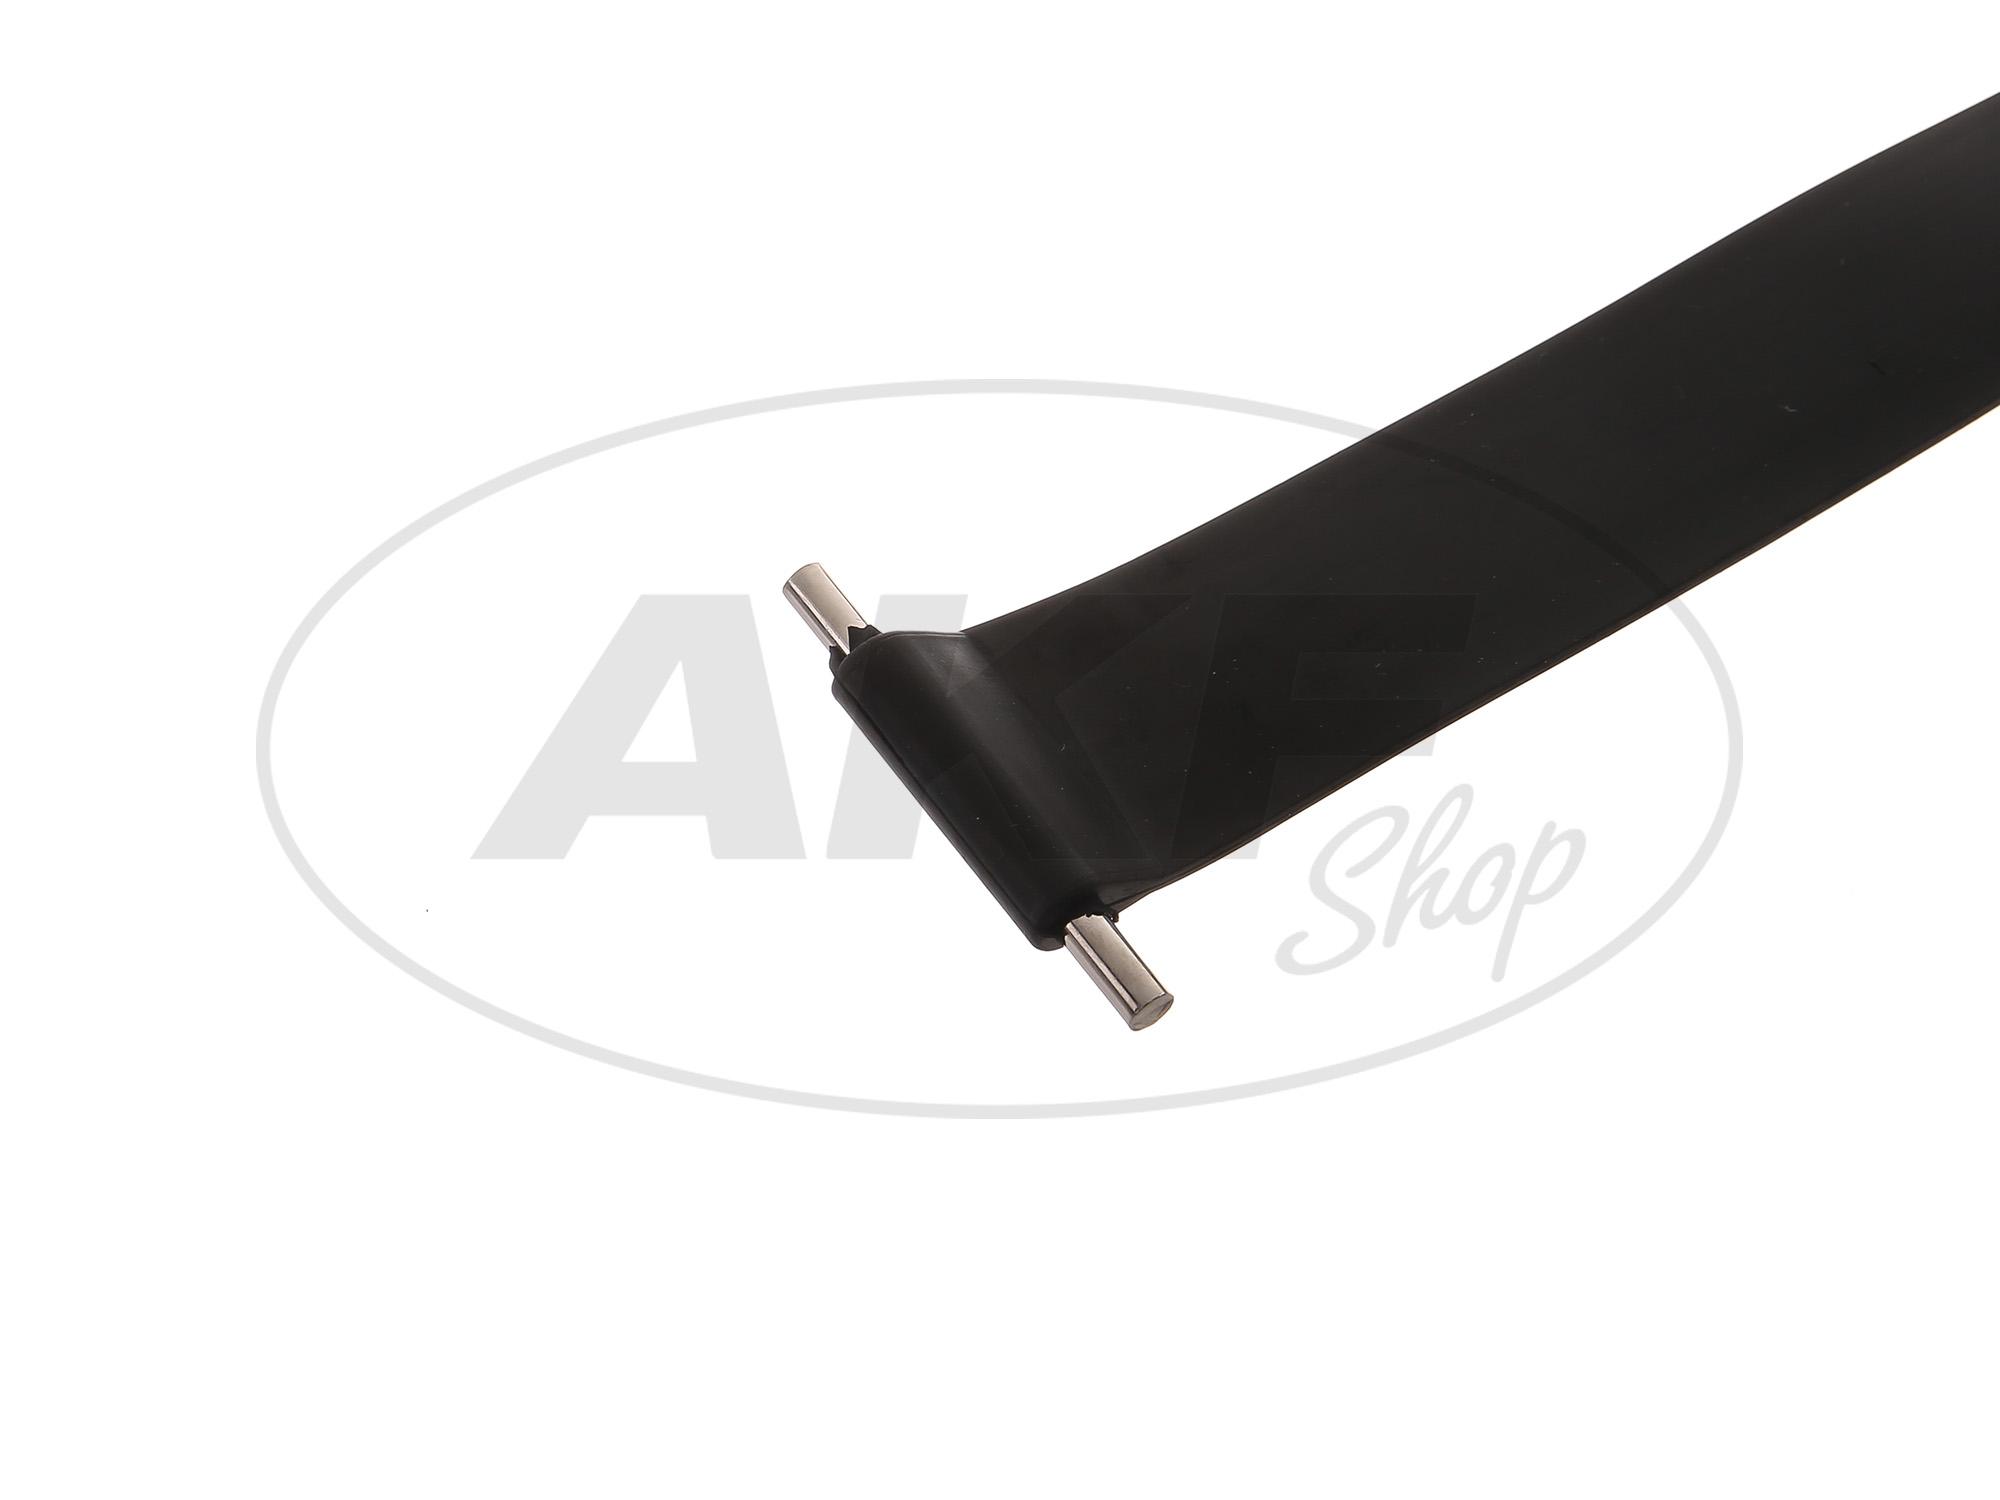 spannband batterie f r simson s50 s51 s70 kr51. Black Bedroom Furniture Sets. Home Design Ideas